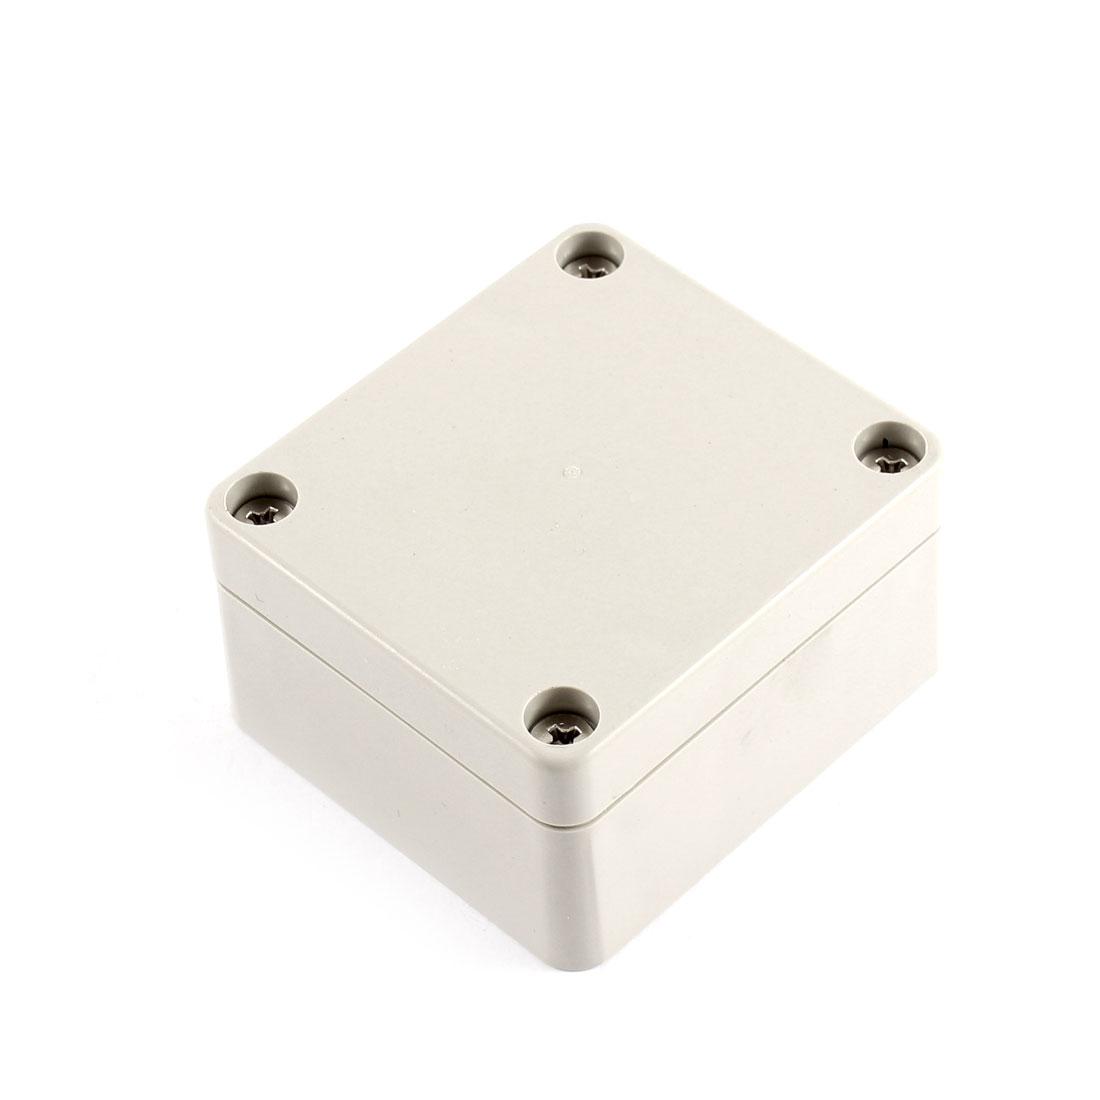 63 x 58 x 35mm Waterproof Plastic Enclosure Case Small Project Box